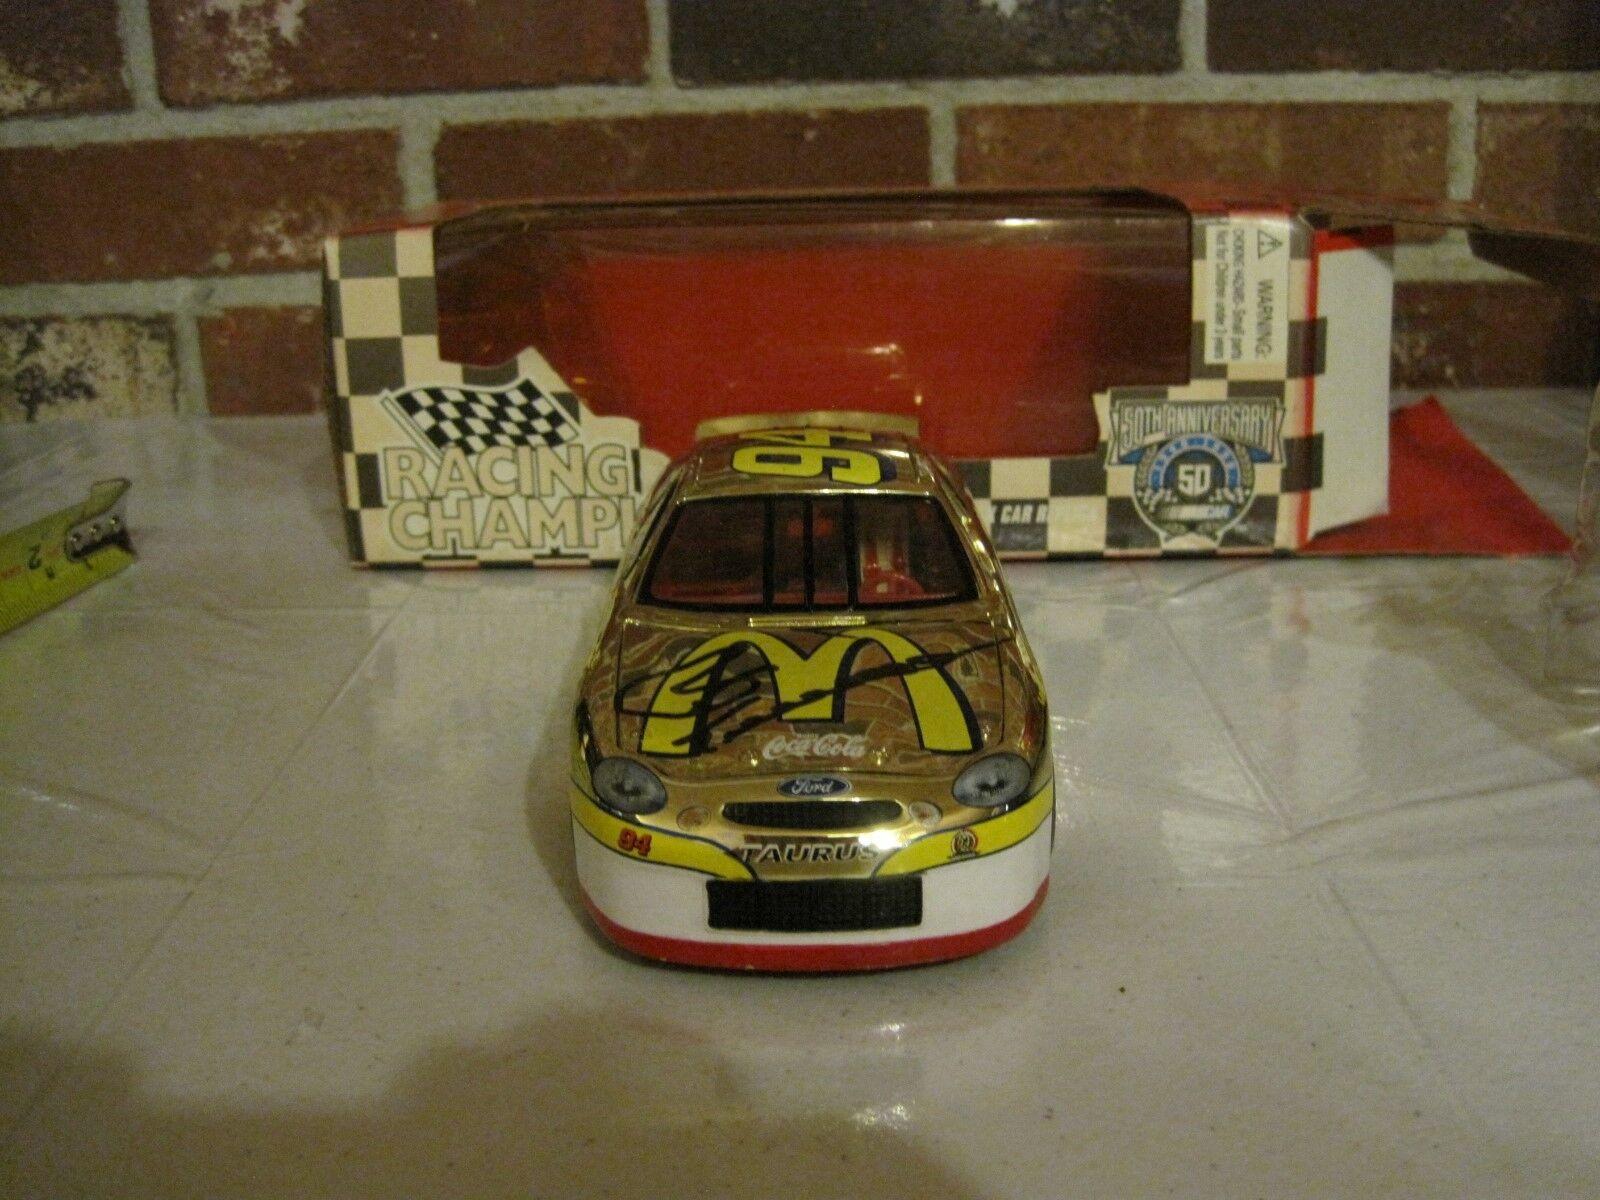 Autógrafo de 1998 50TH aniversario Bill Elliott 1 24 réplica diecast Stock Car